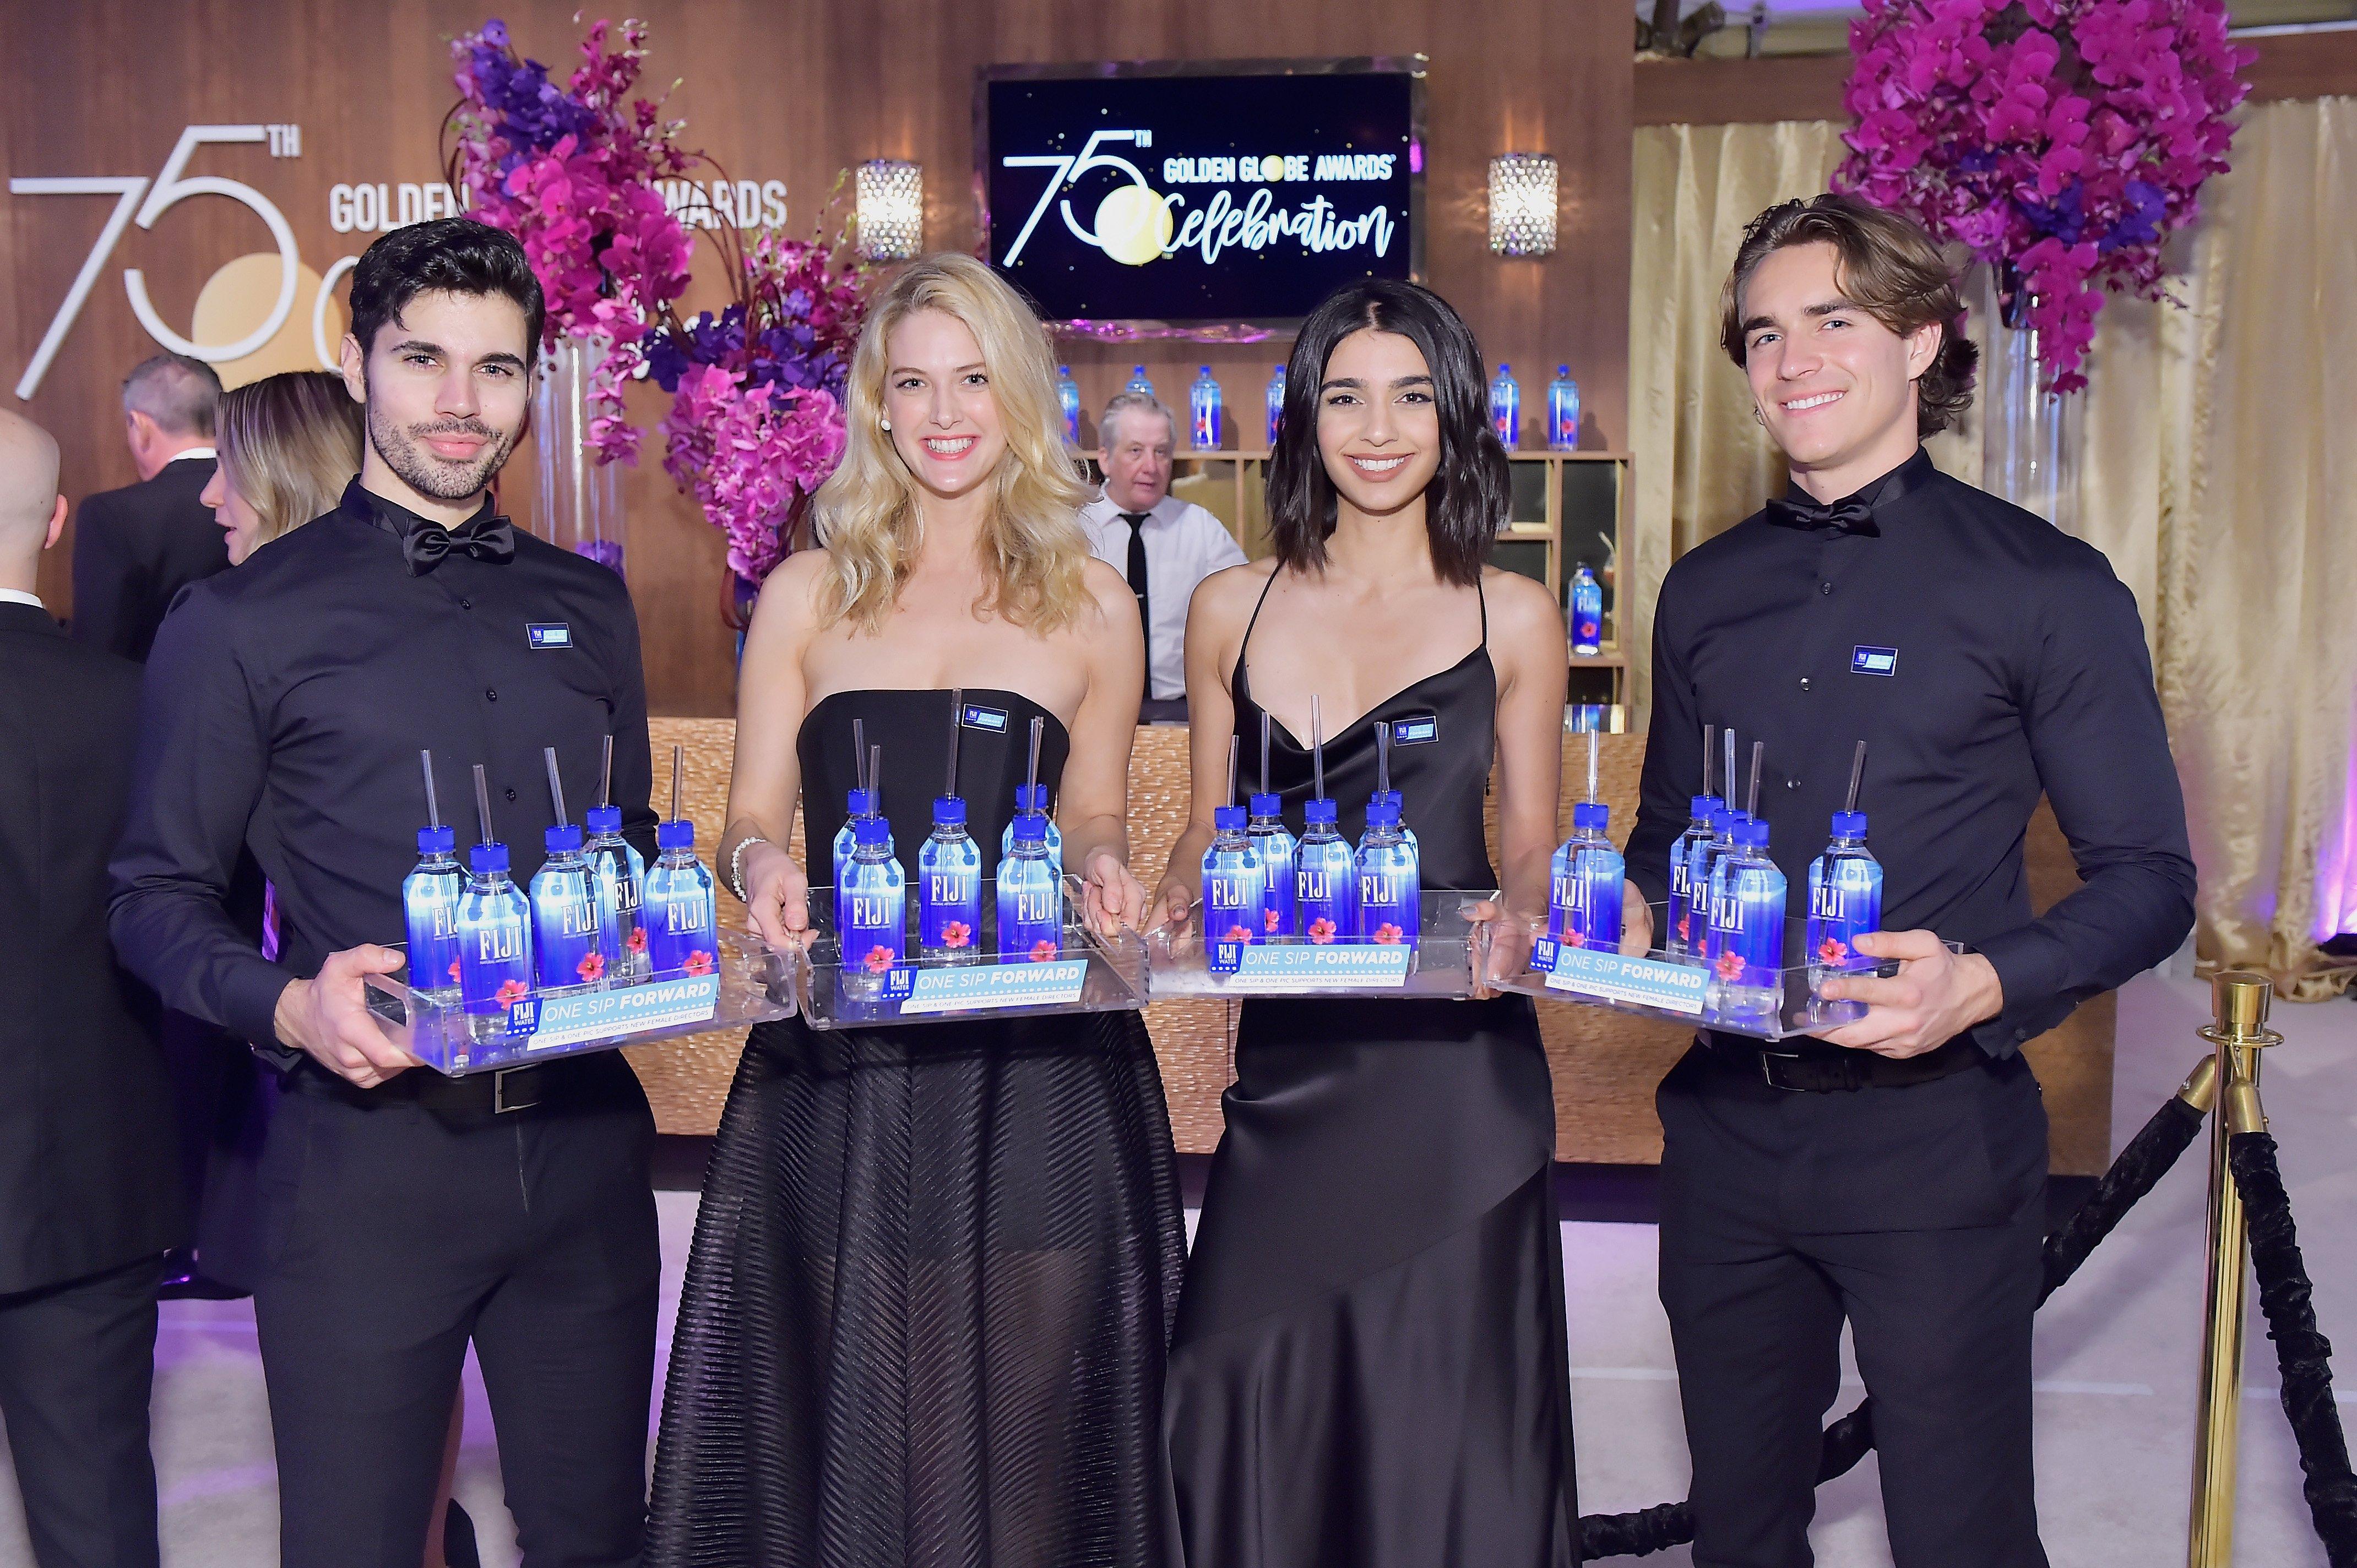 Golden globes 2018, model staffing, model staffers